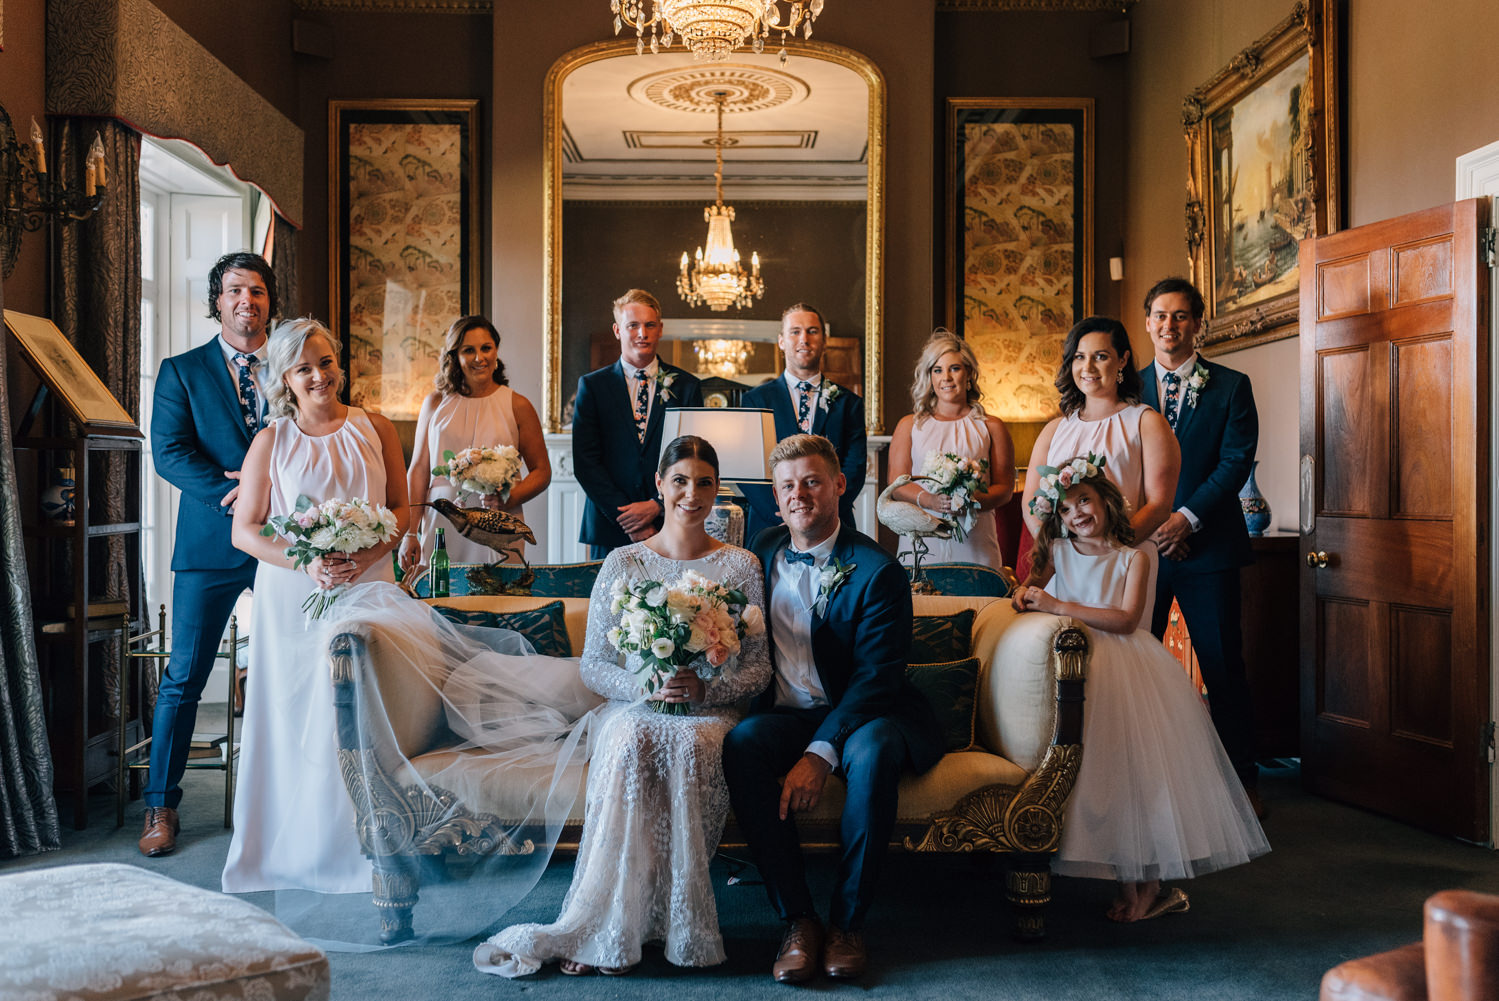 Quamby-Wedding-Photography-83.jpg